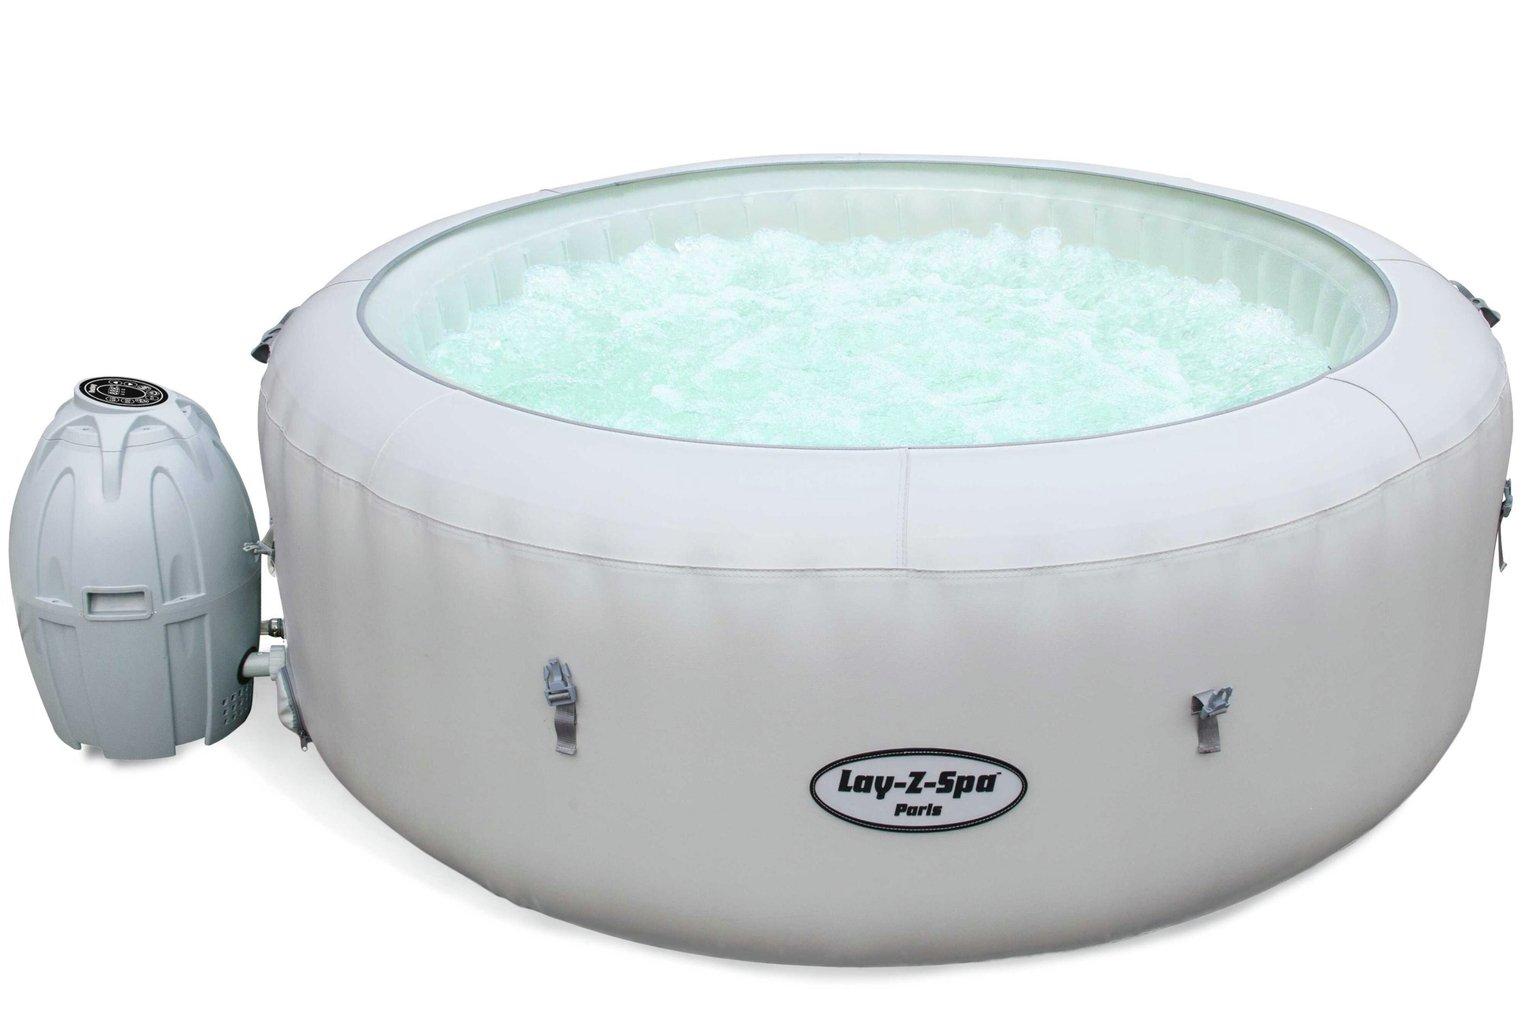 Lay-Z-Spa Paris 6 Person LED Hot Tub